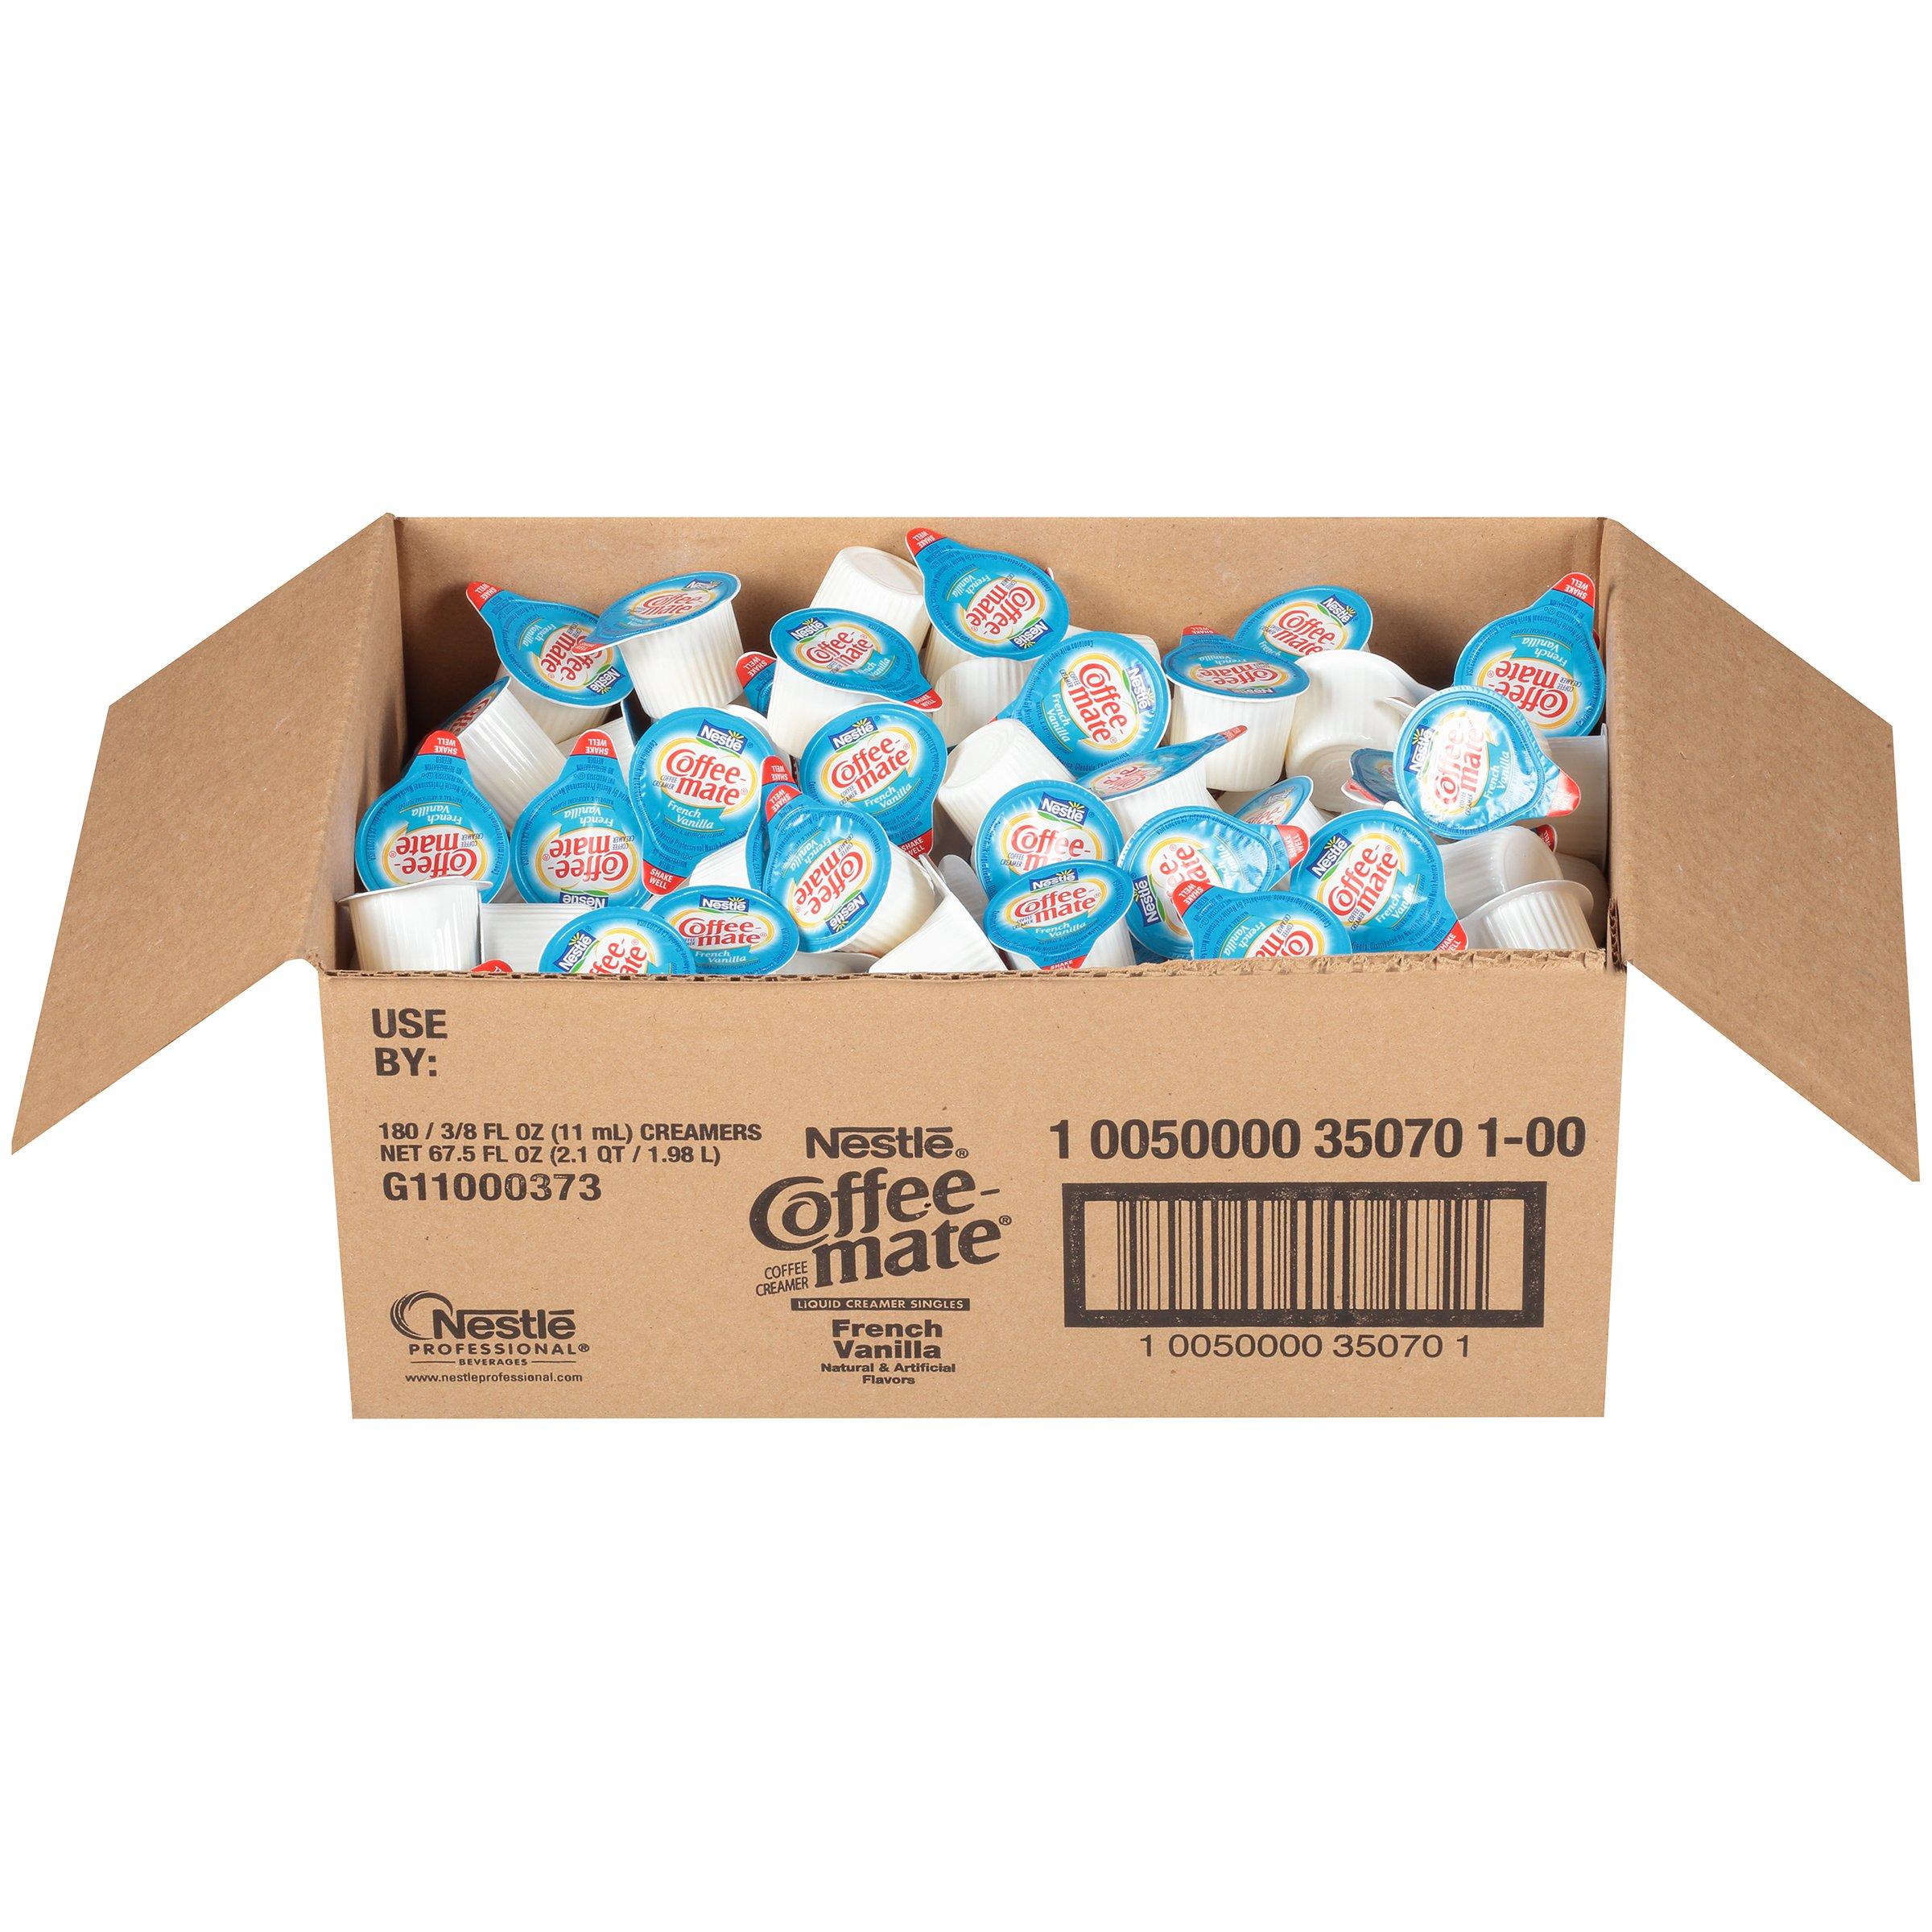 Nestle Coffee-mate Coffee Creamer, French Vanilla, liquid creamer singles, Pack of 180 by Nestle Coffee Mate